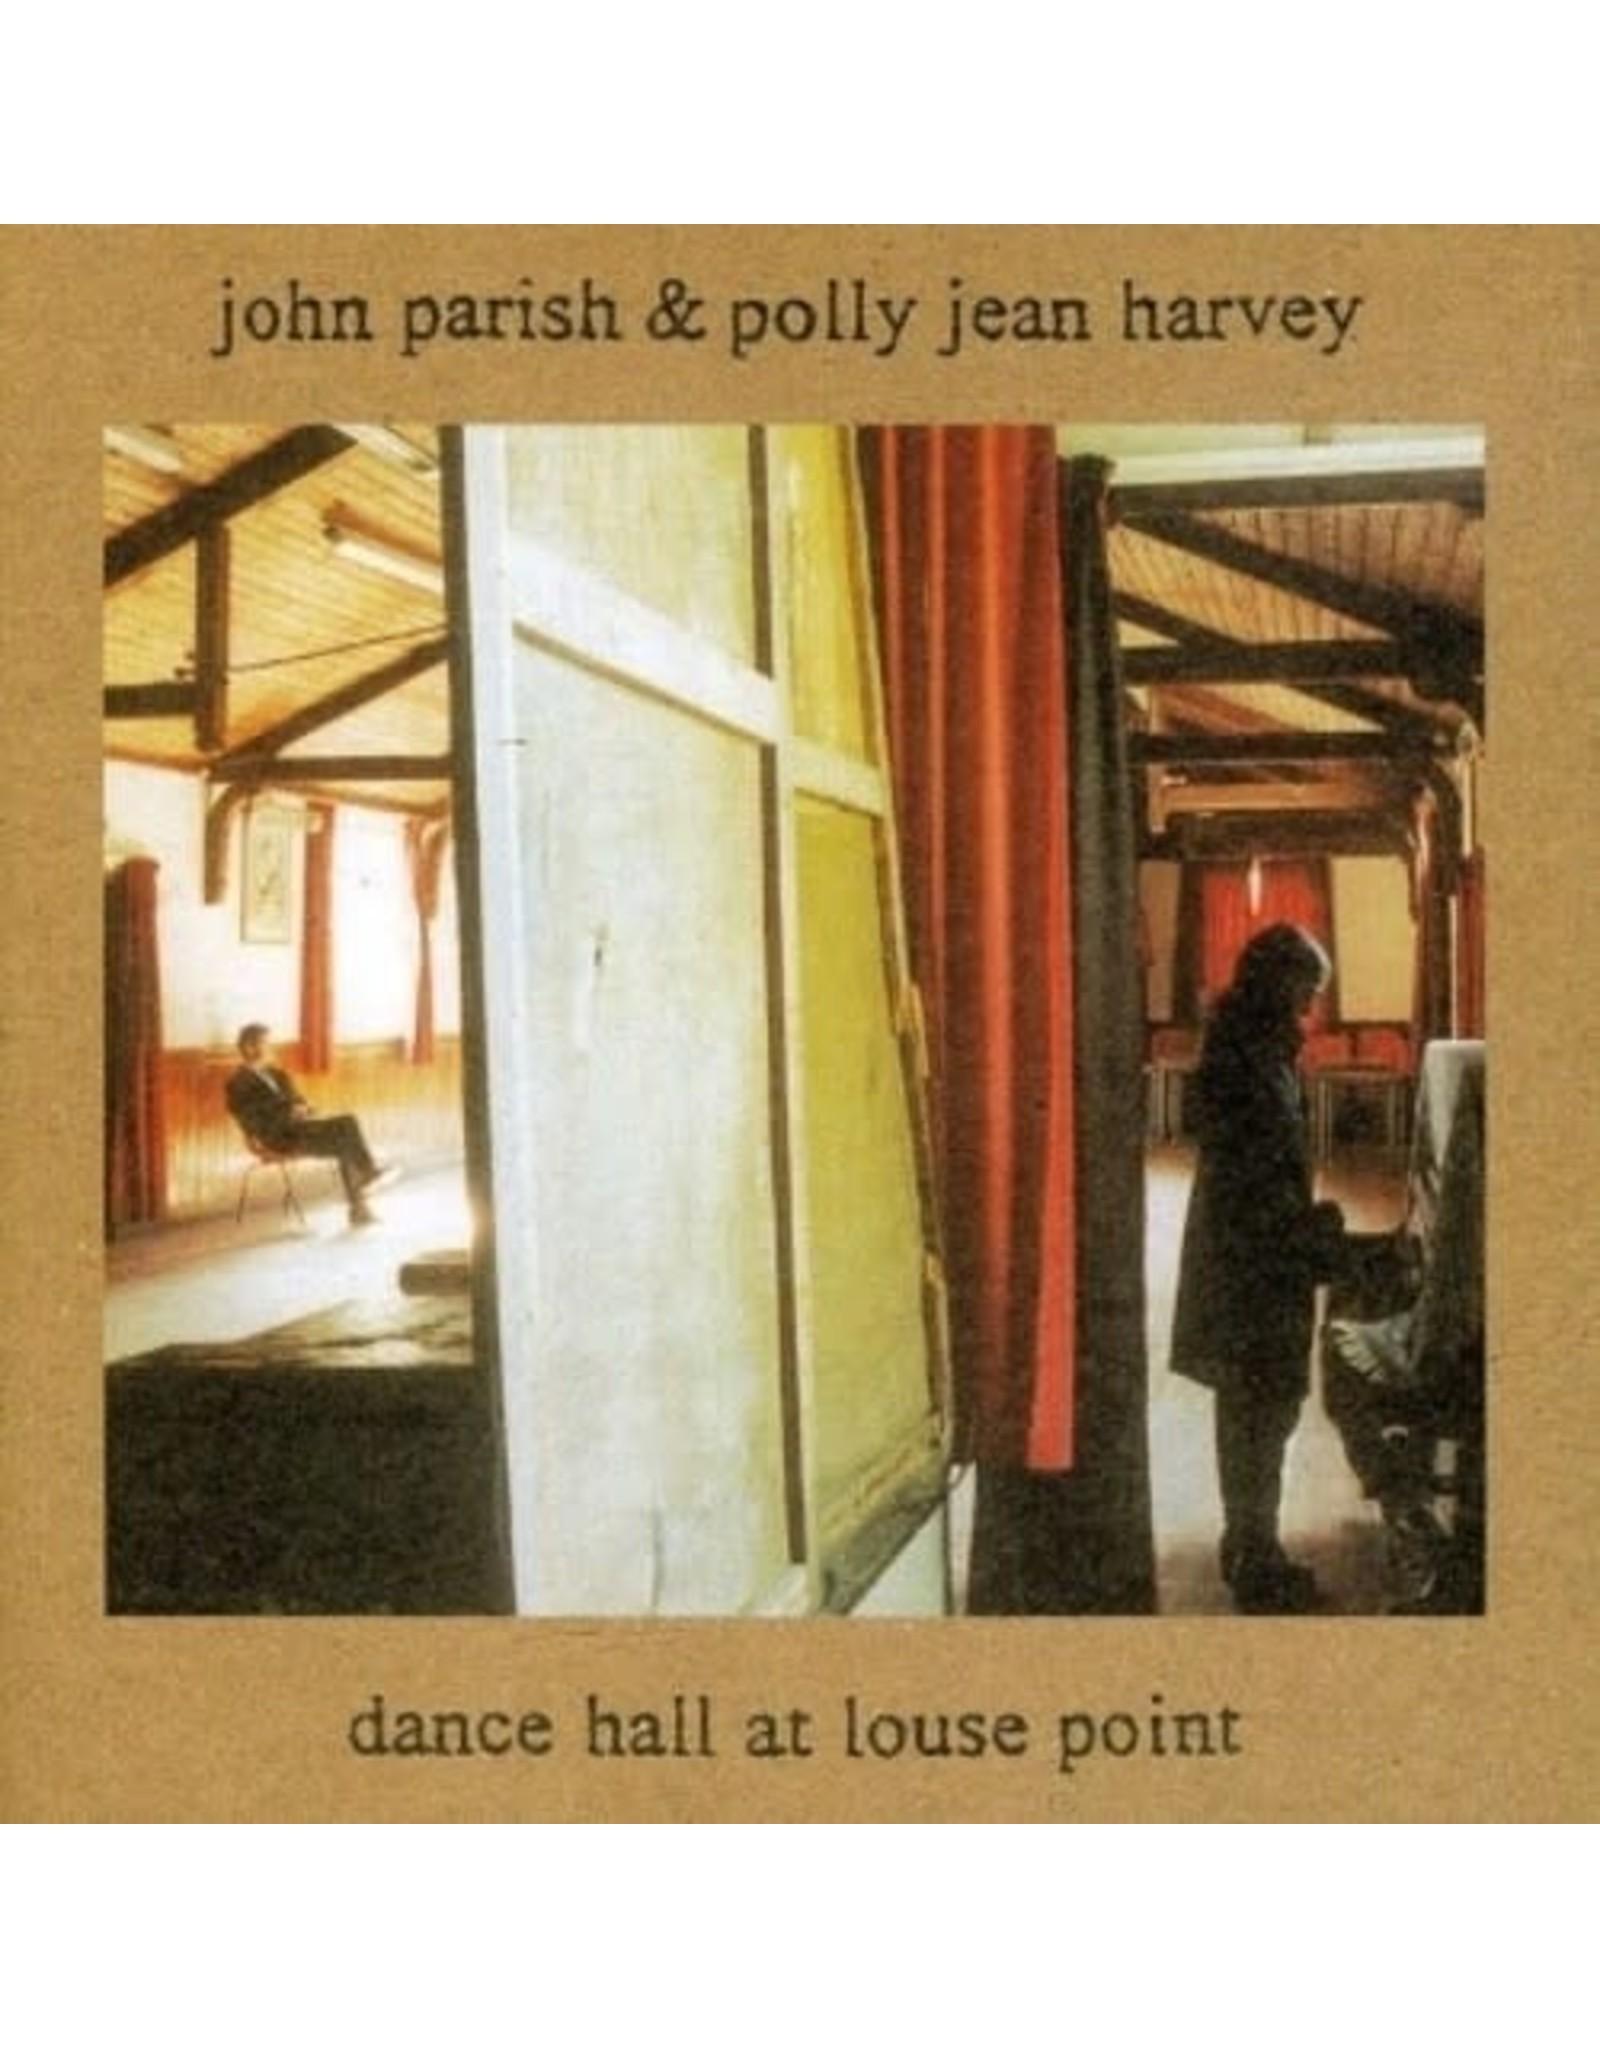 New Vinyl John Parrish & Polly Jean Harvey - Dance Hall At Louse Point LP